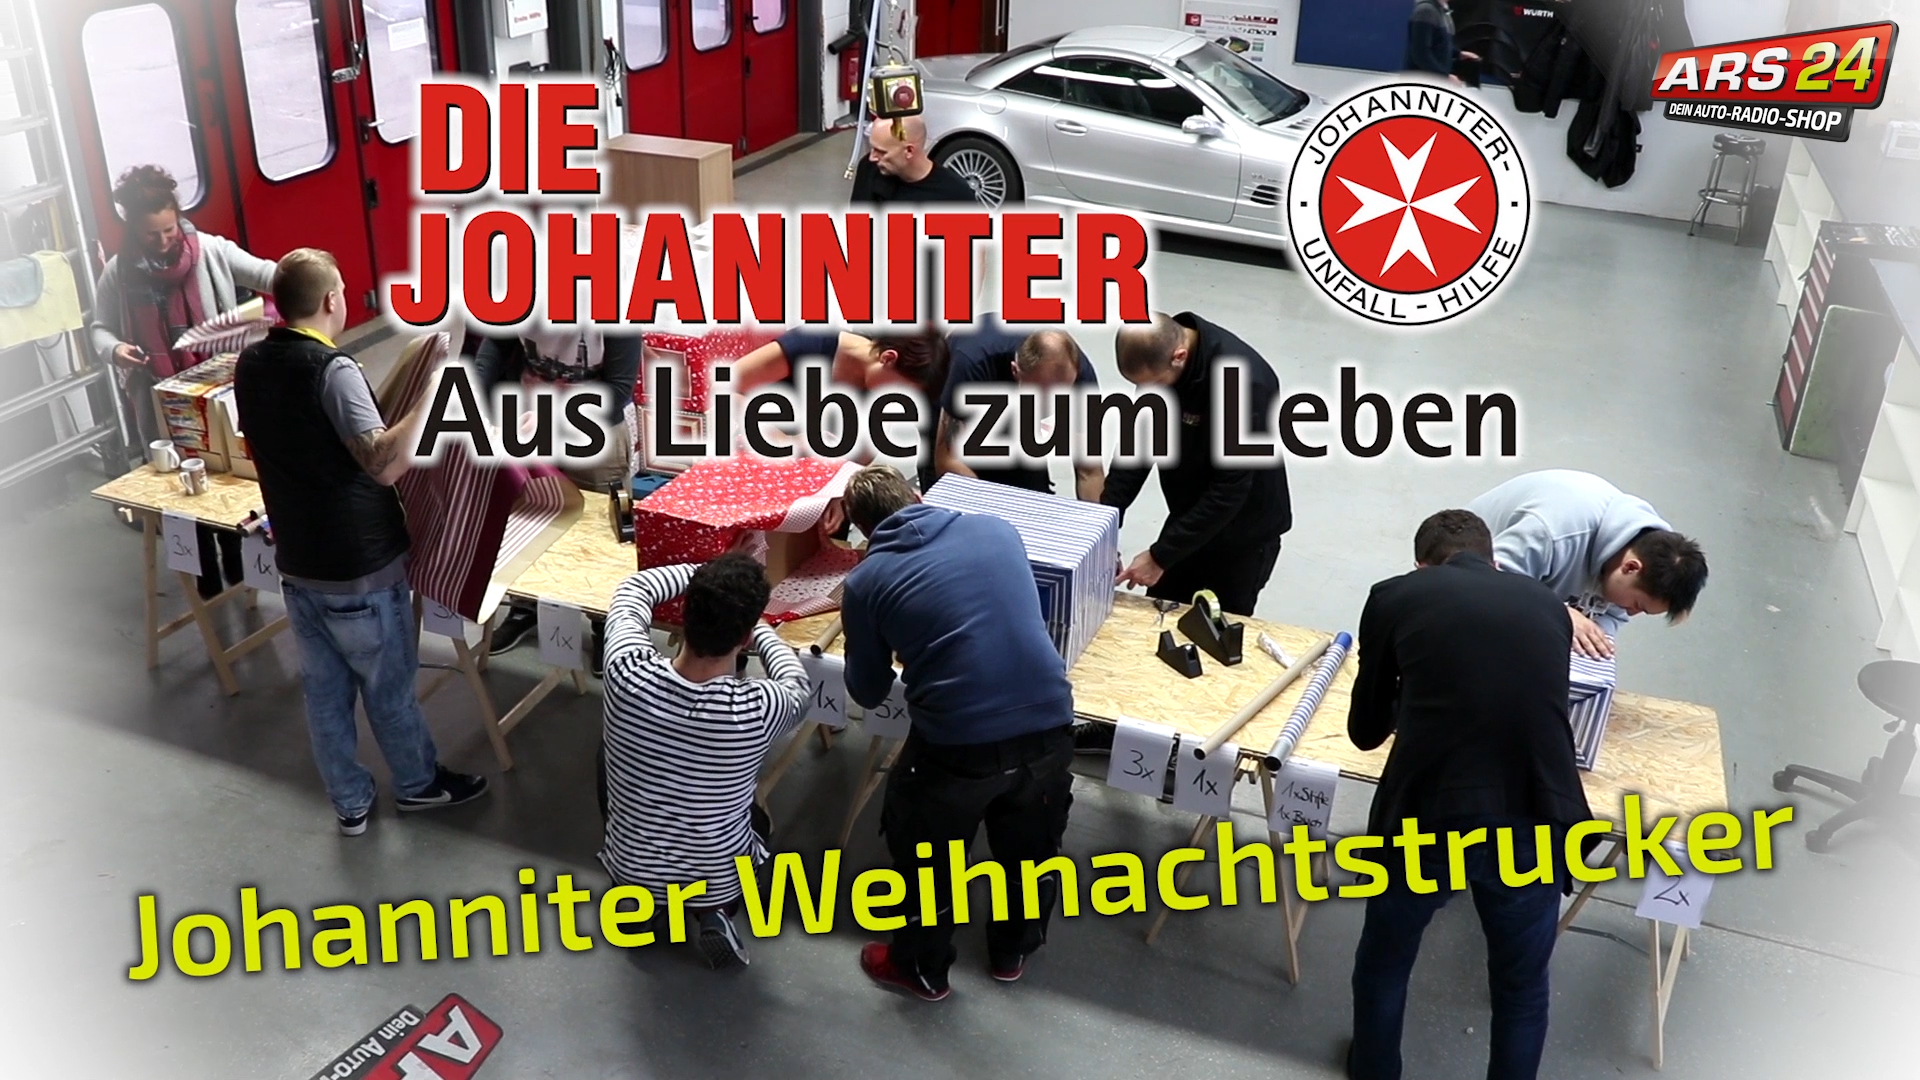 Johanniter1